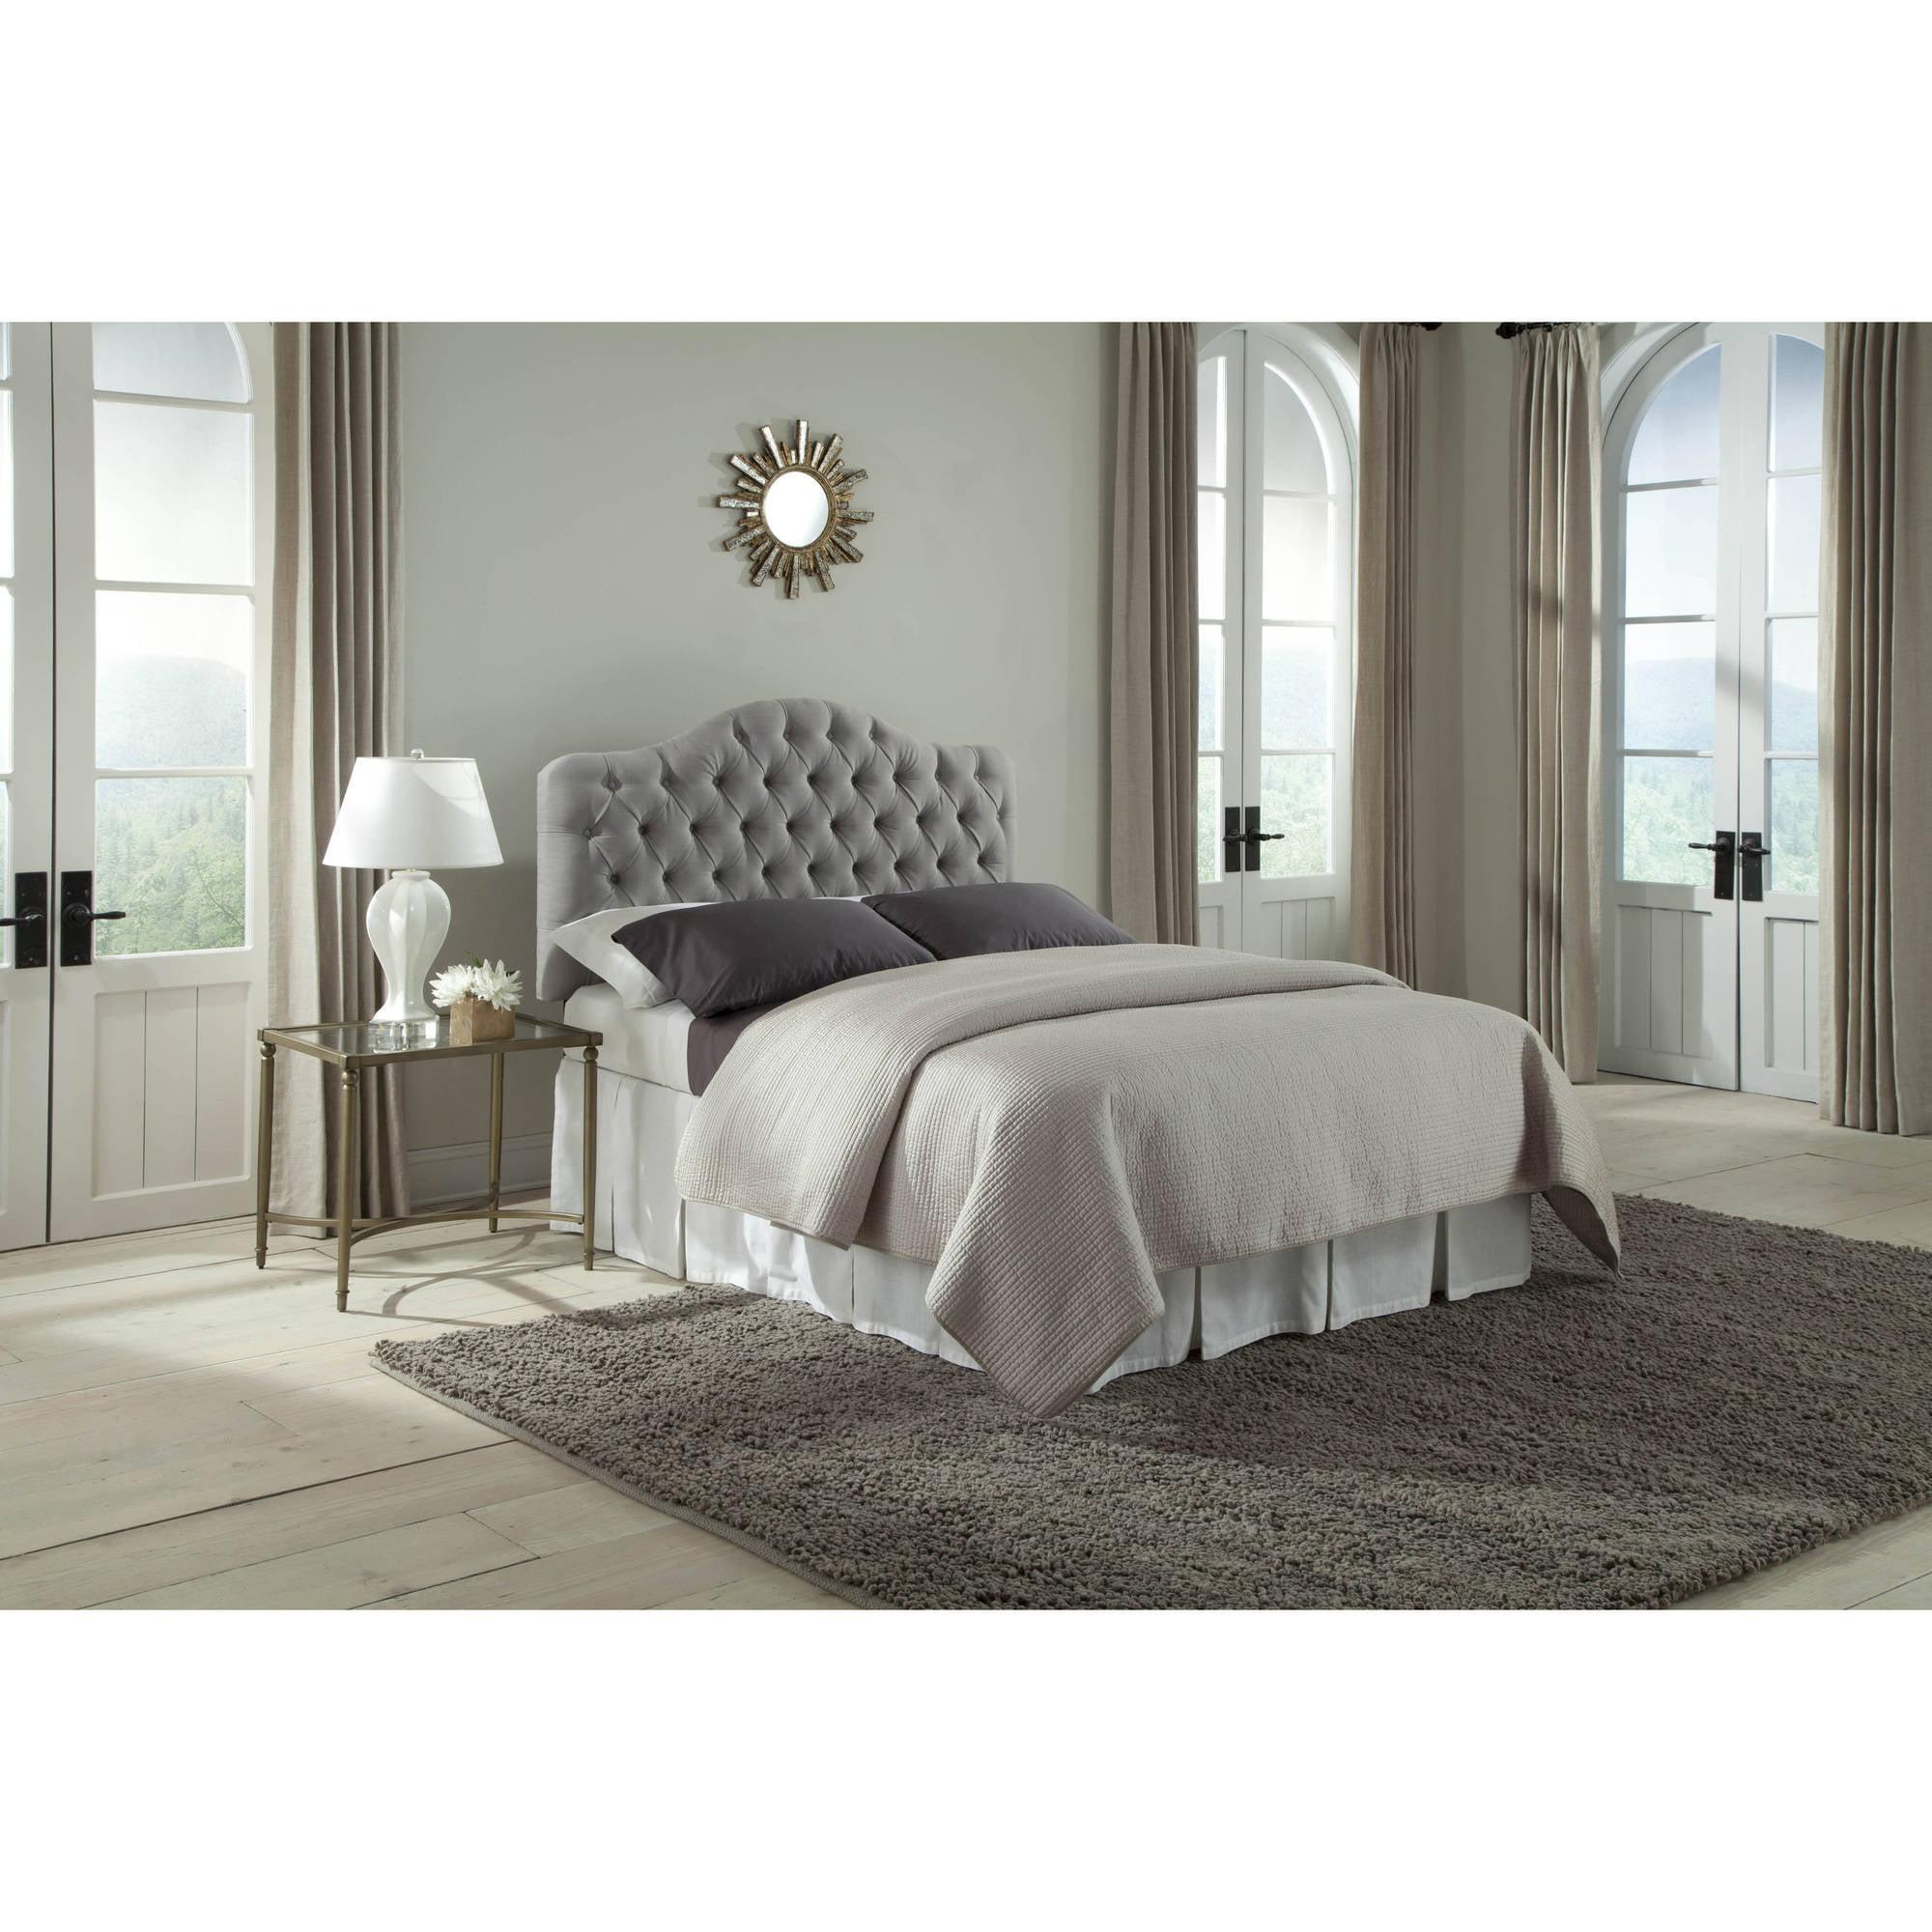 Bed frames headboards - Fashion Bed Group By Leggett Platt Martinique Headboard Multiple Sizes Colors